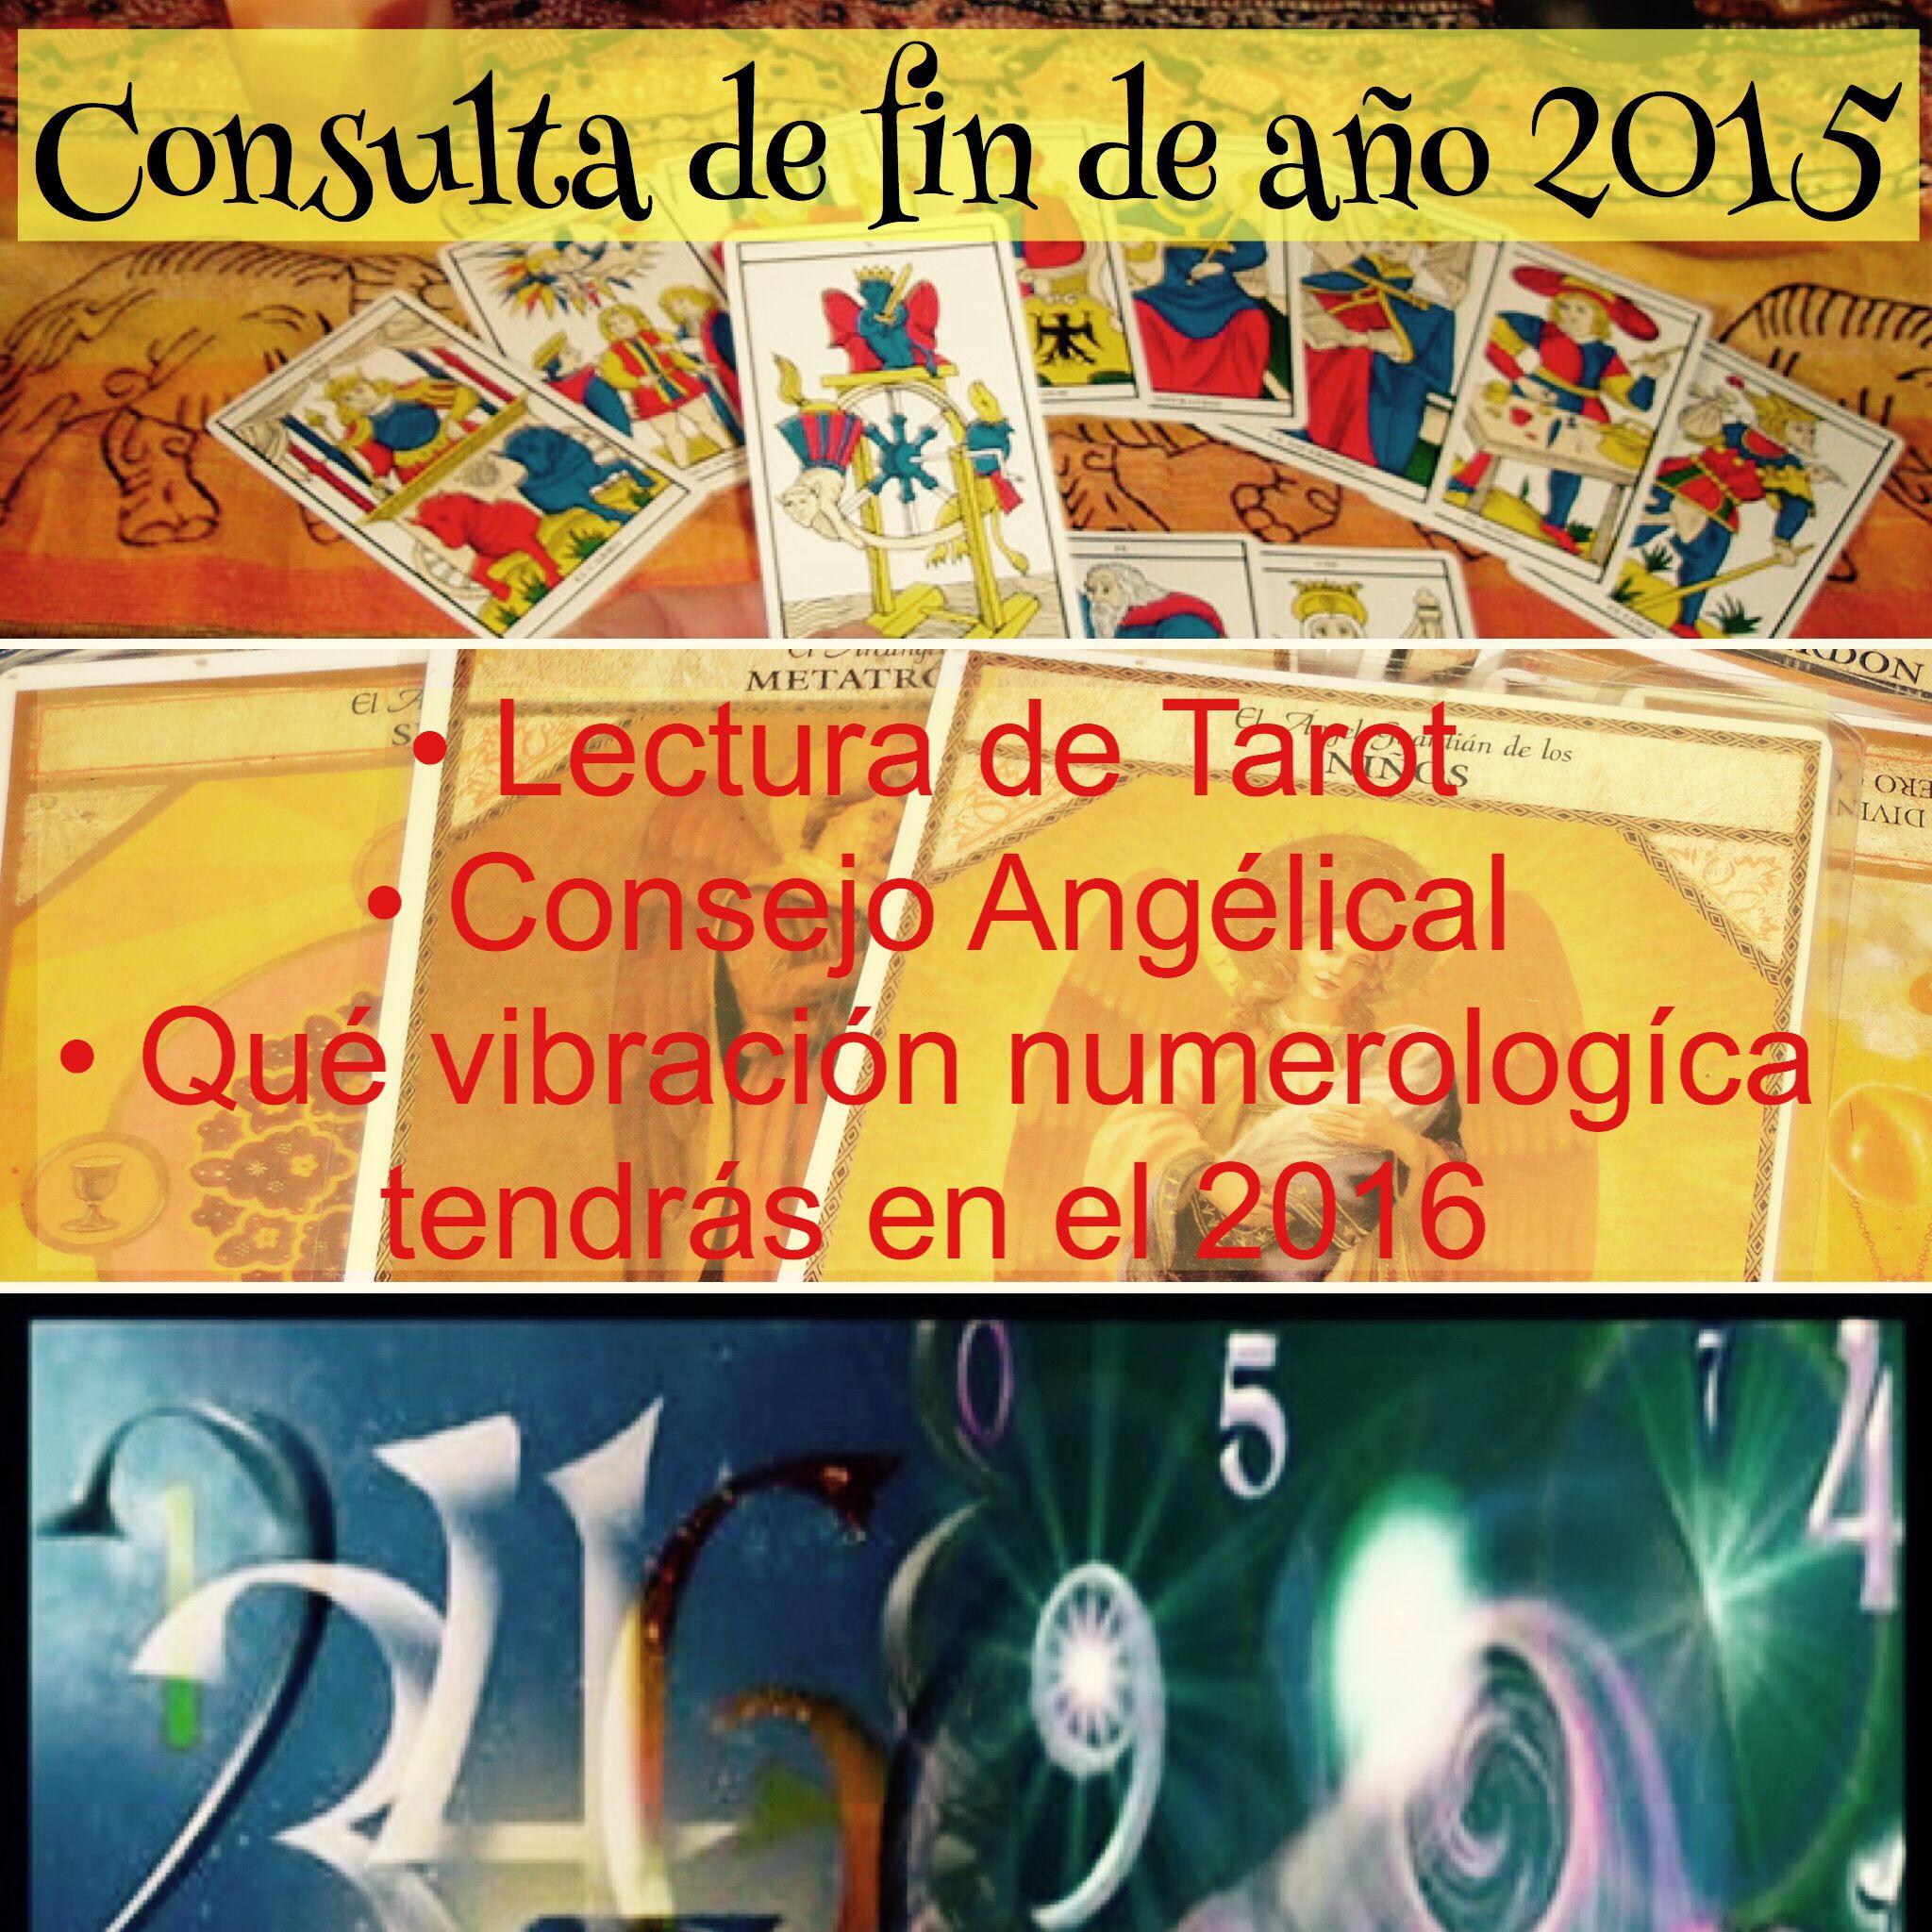 Consulta espiritual de fin de año 2015 #lecturadetarot #numerologia #angeles #mensajeangelico